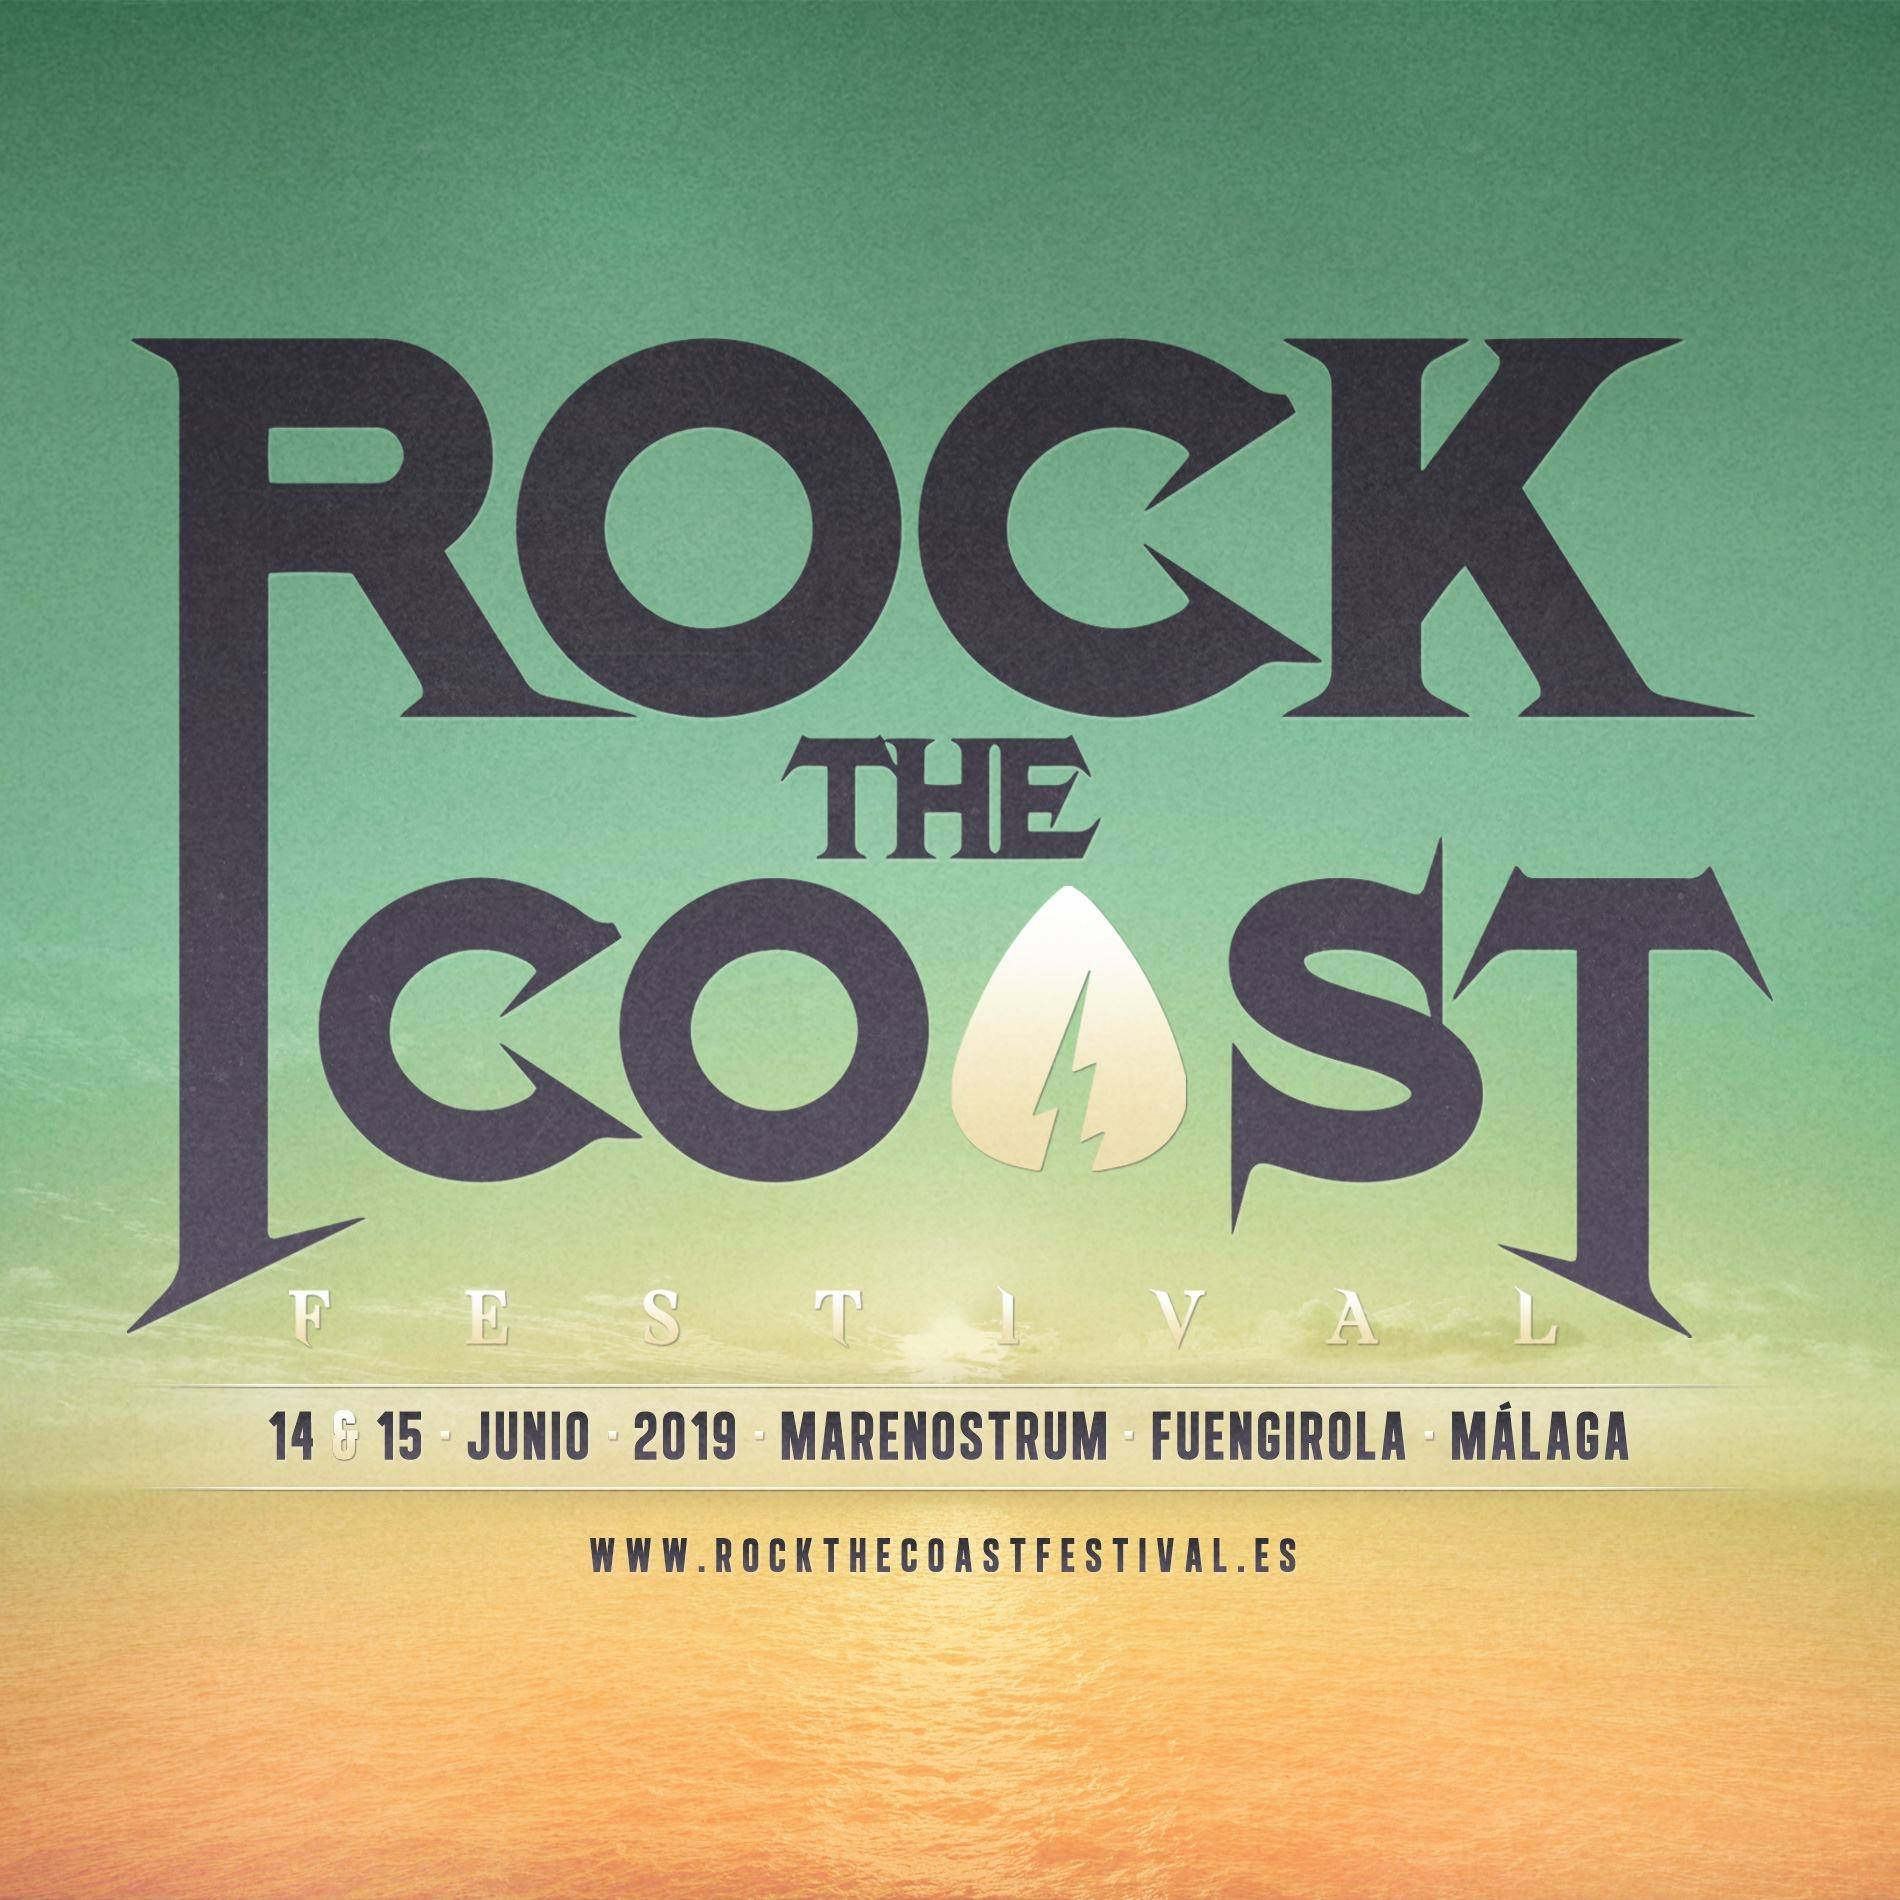 ROCK THE COAST FESTIVAL anuncia la distribución de bandas por días